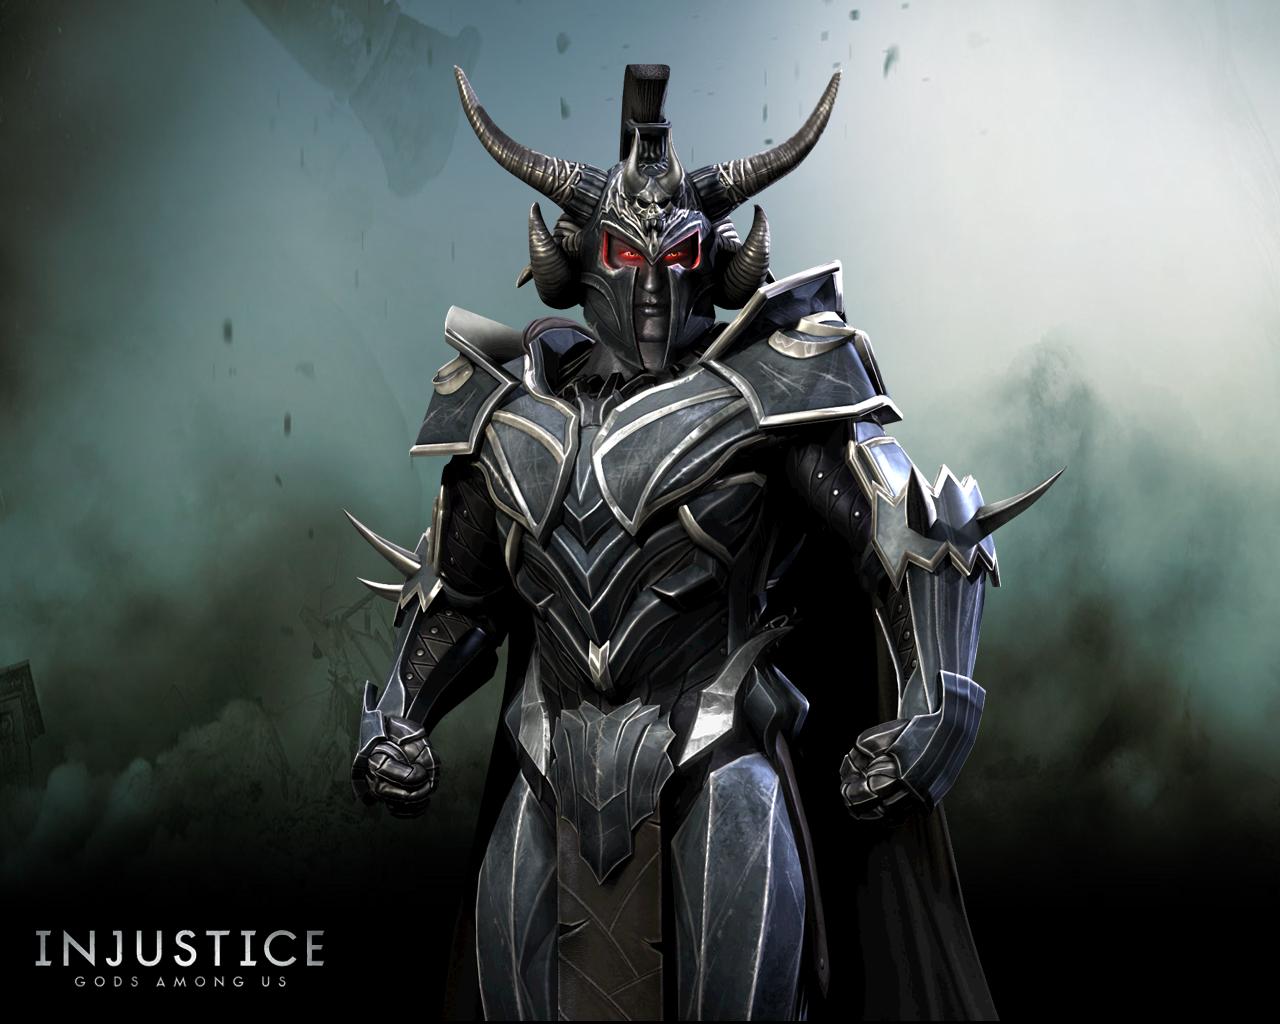 Injustice Gods Among Us Wallpaper 1280 1024 Ares Wasduk